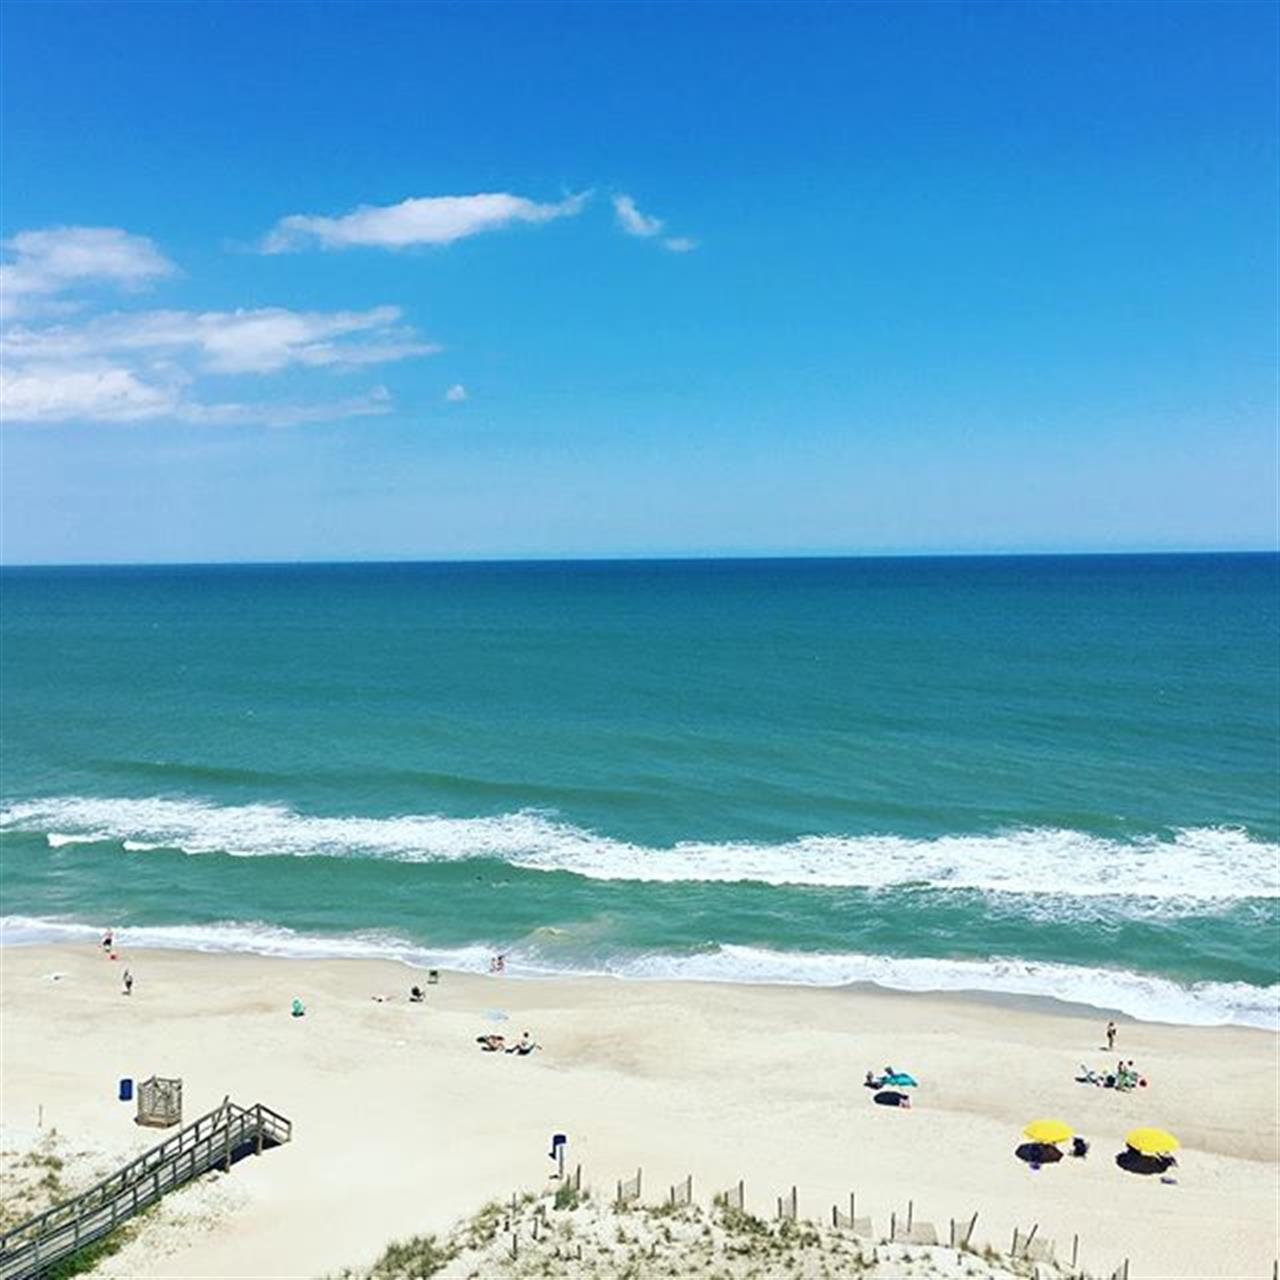 Ocean views from Pelican Watch #leadingrelocal